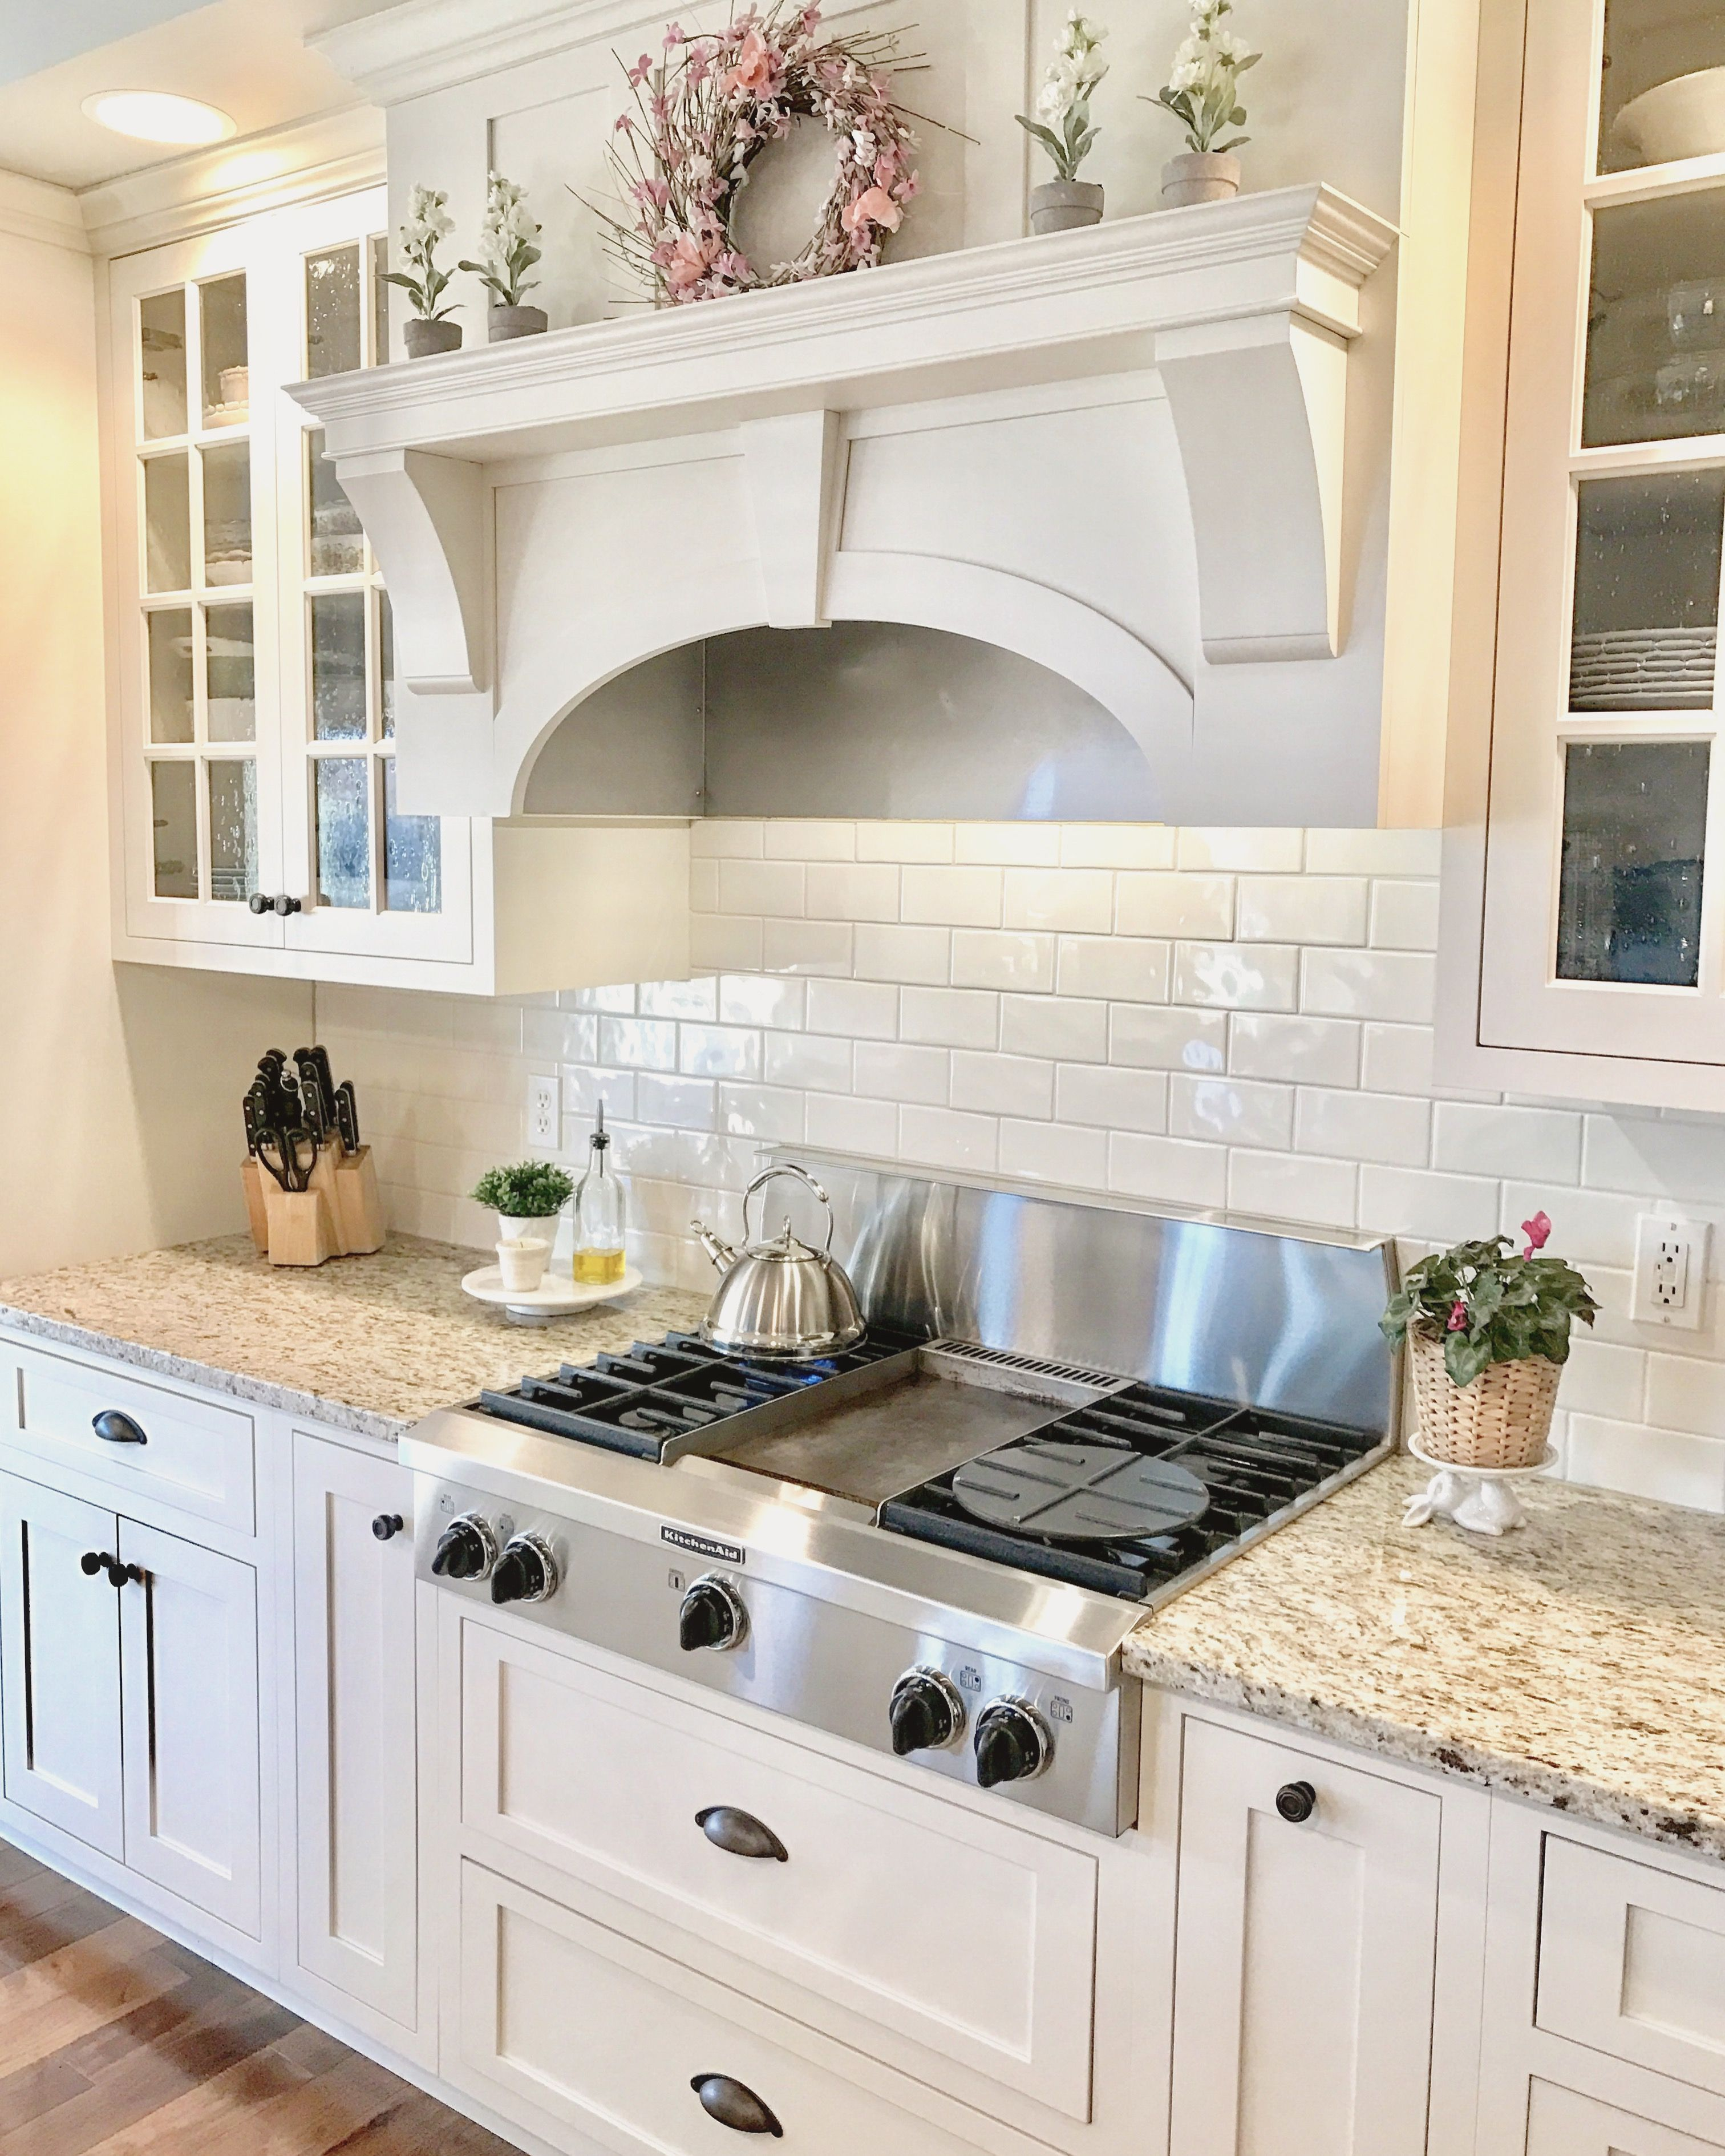 antique white kitchen cabinets design planner 27 amazing photos gallery in 2019